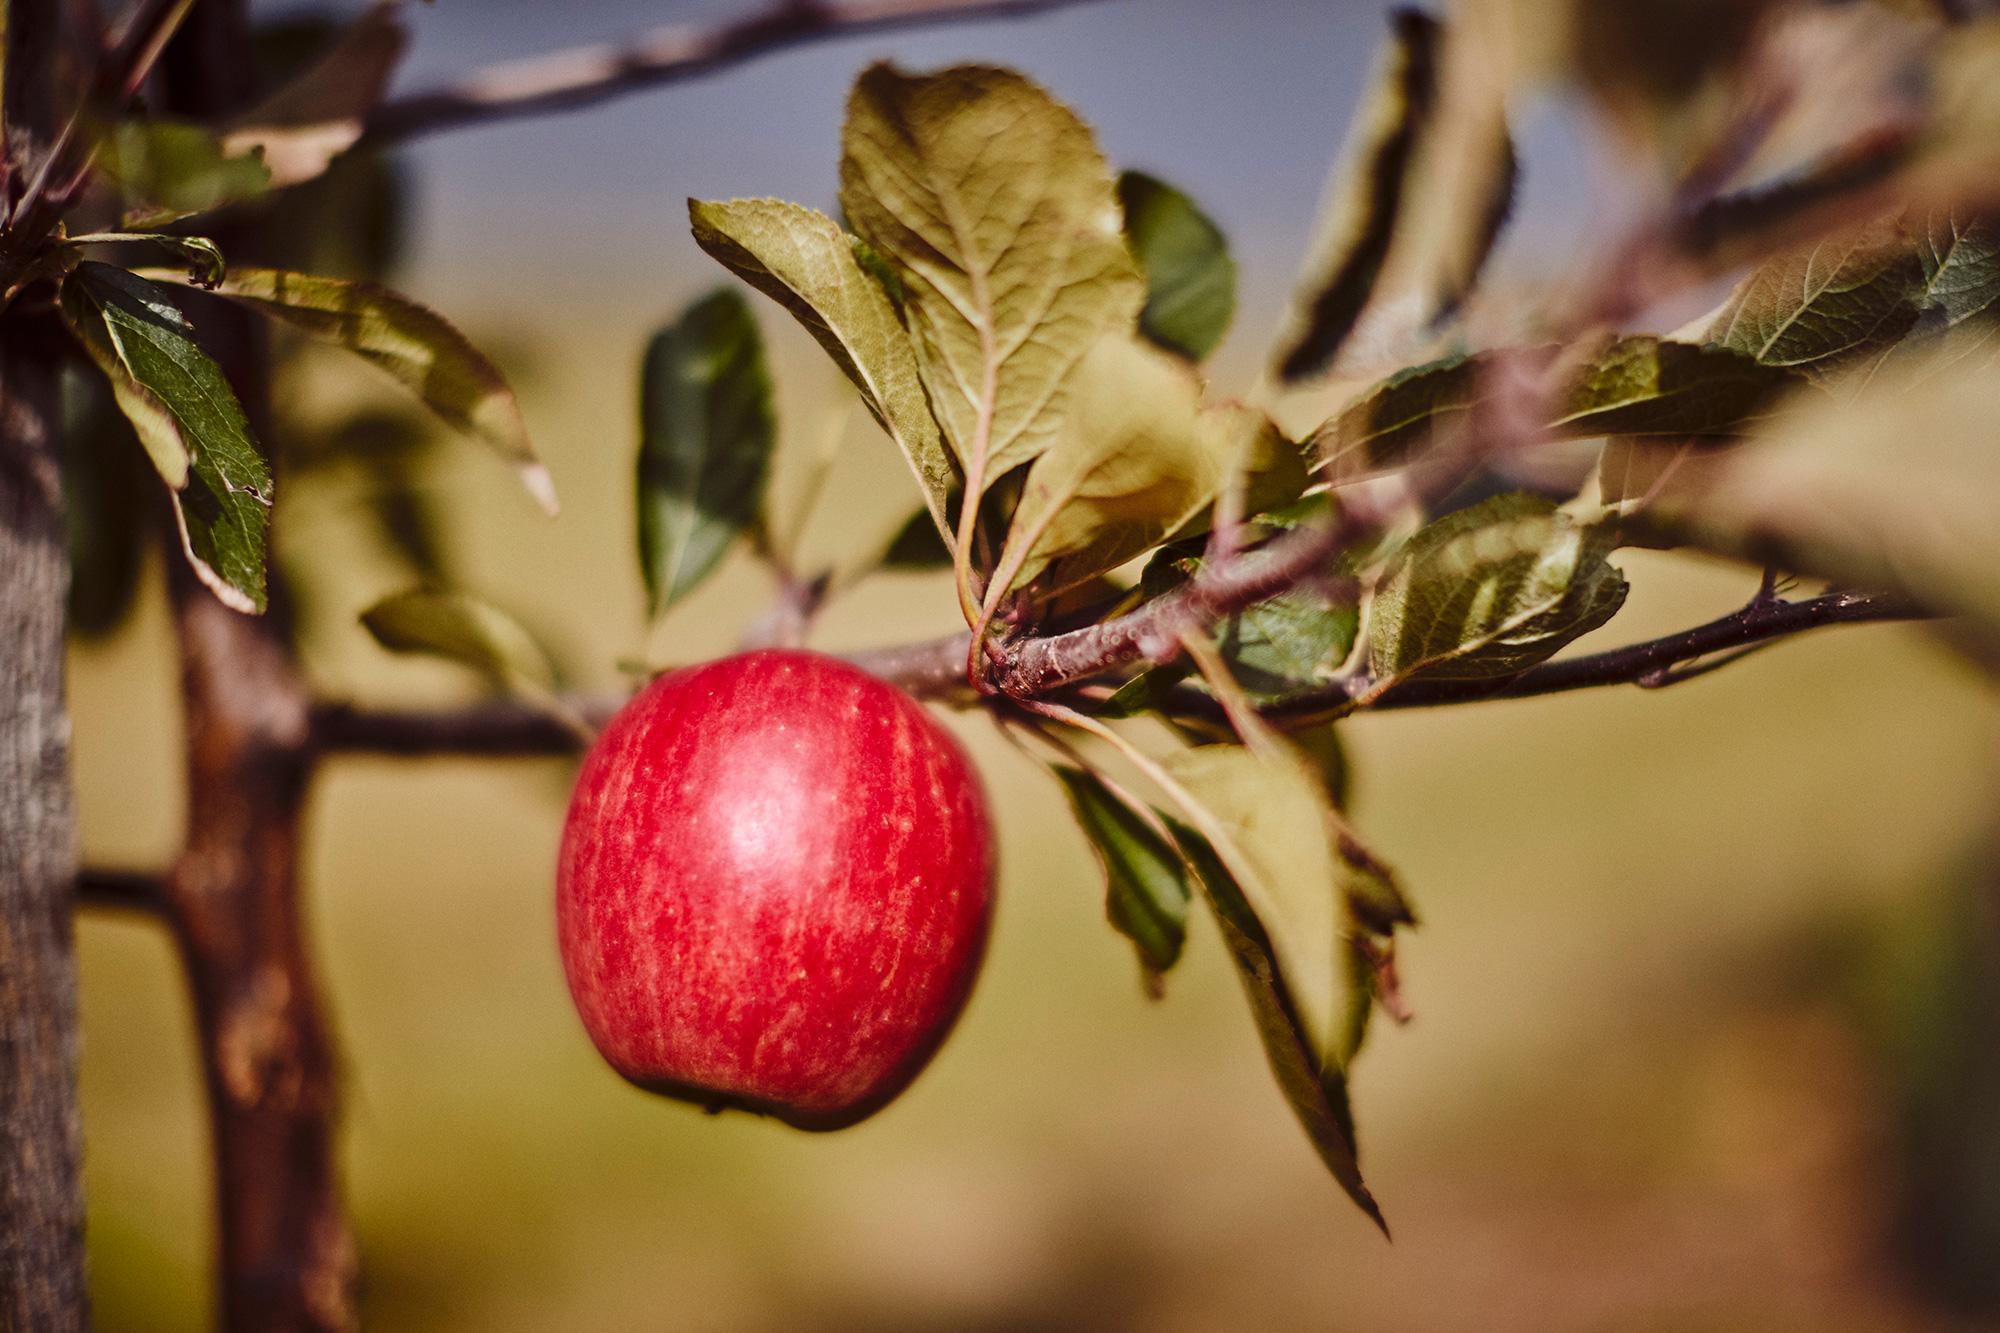 saxbys-cider-apples-1.jpg